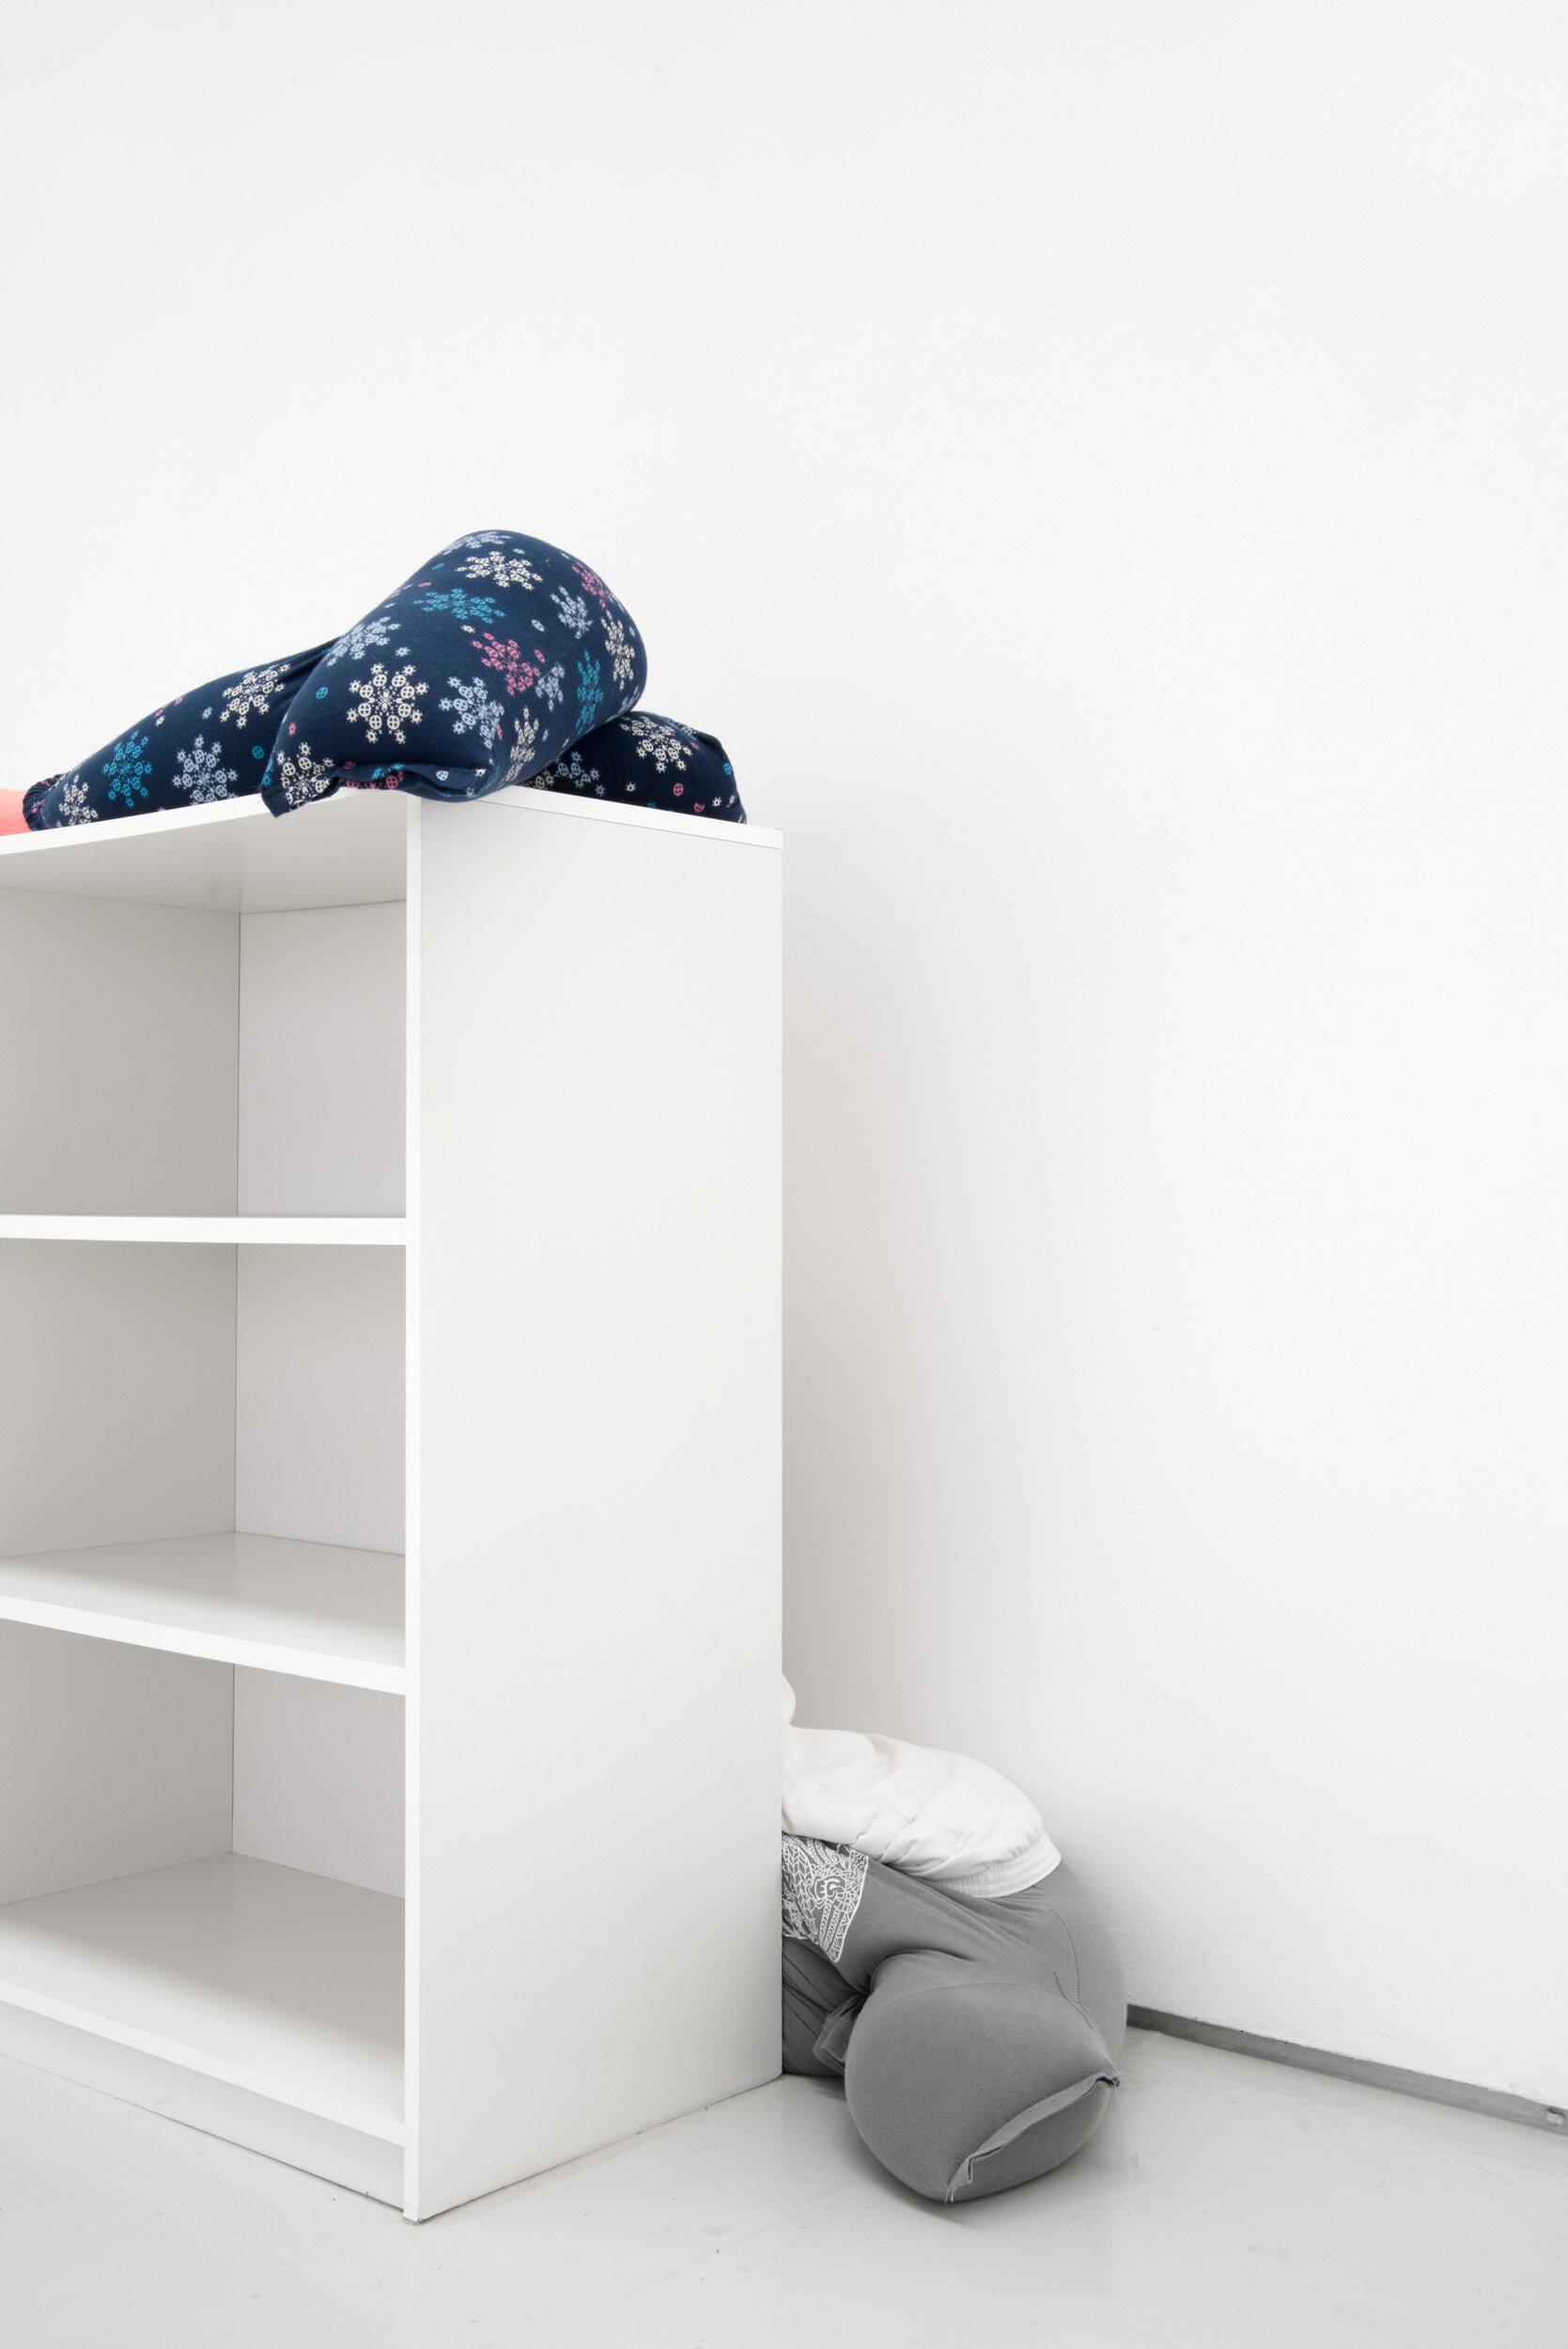 Collapse, slide, bottom-out beside low on a bookshelf, Alex Farrar, Bloc Projects, 2019, 3.jpg